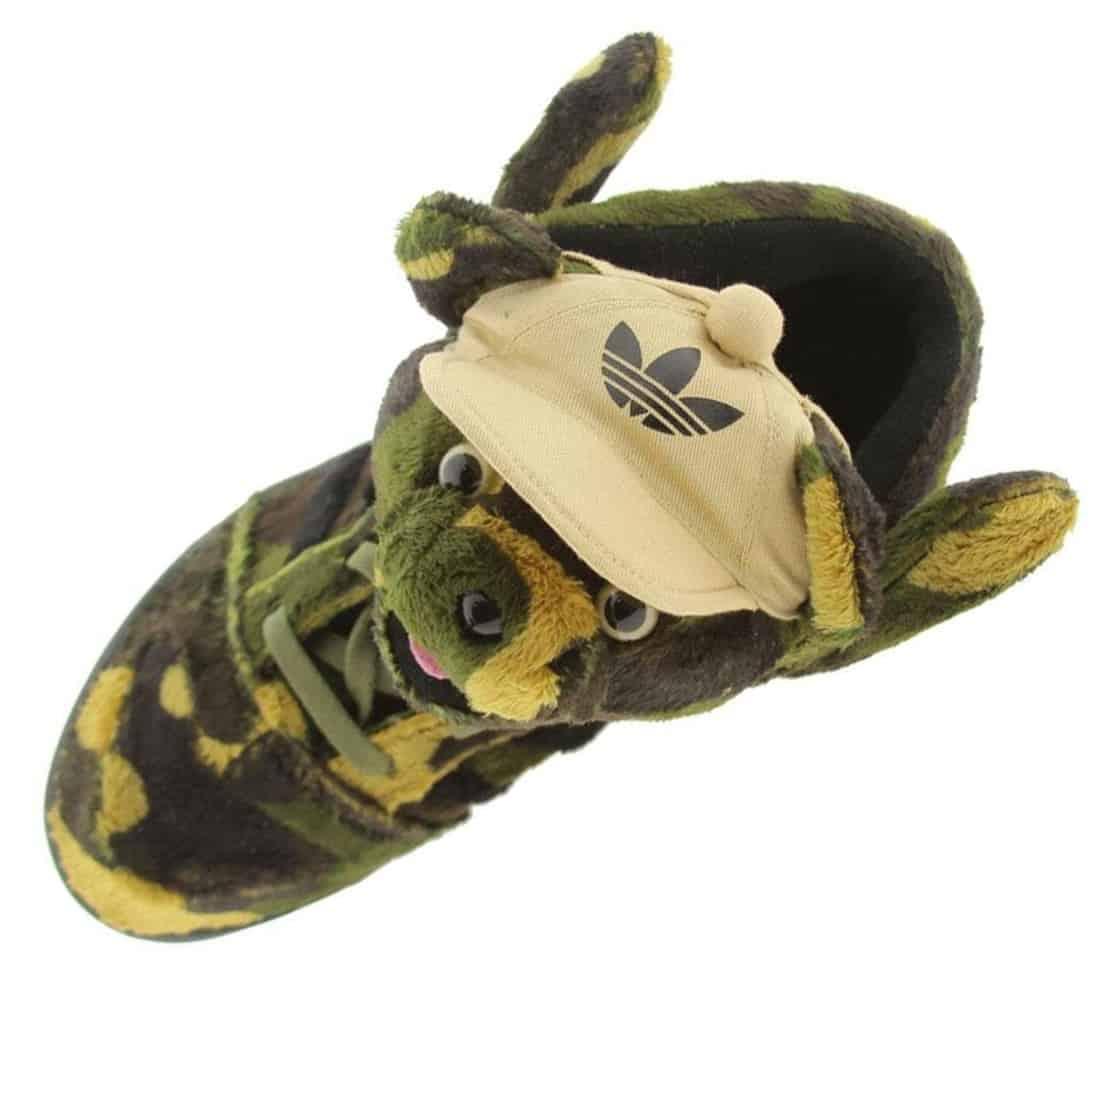 Adidas Jeremy Scott Camo Bear Sneakers Green Buy Cool Shoes